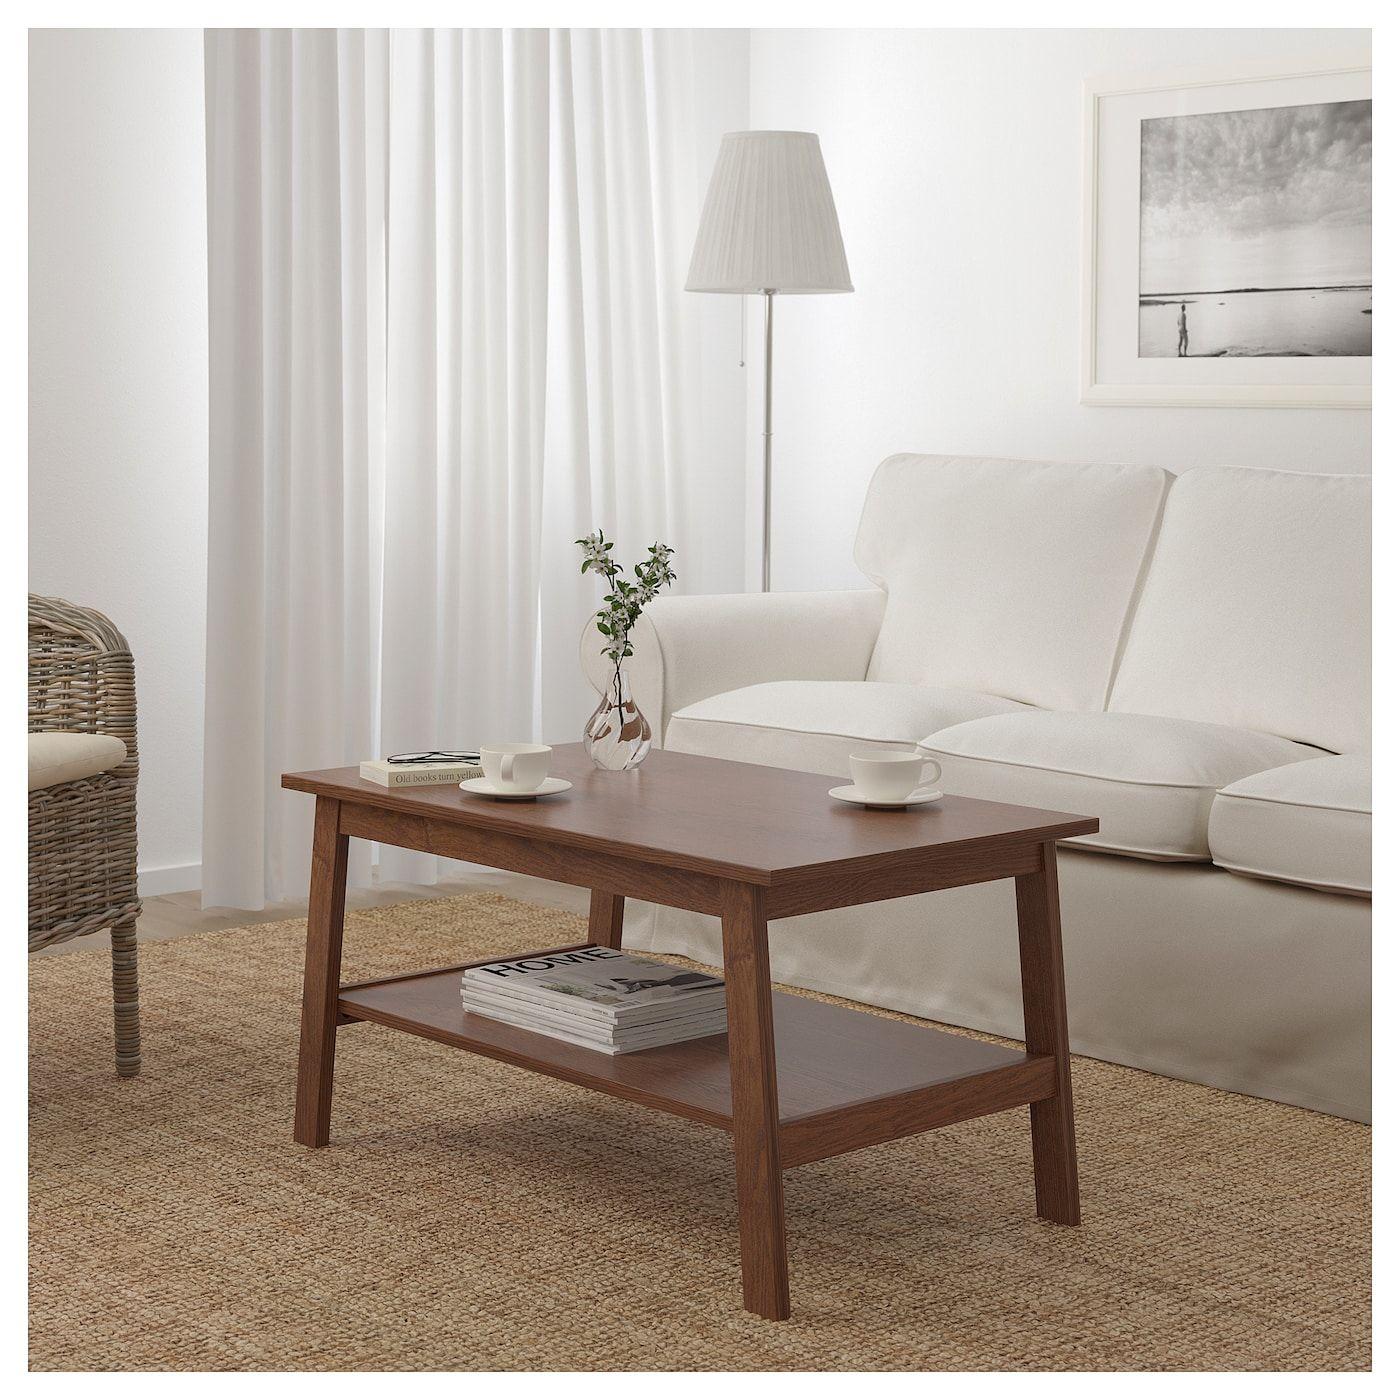 Lunnarp Couchtisch Braun 90x55 Cm Ikea Deutschland Quality Living Room Furniture Coffee Table Coffee Table White [ 1400 x 1400 Pixel ]